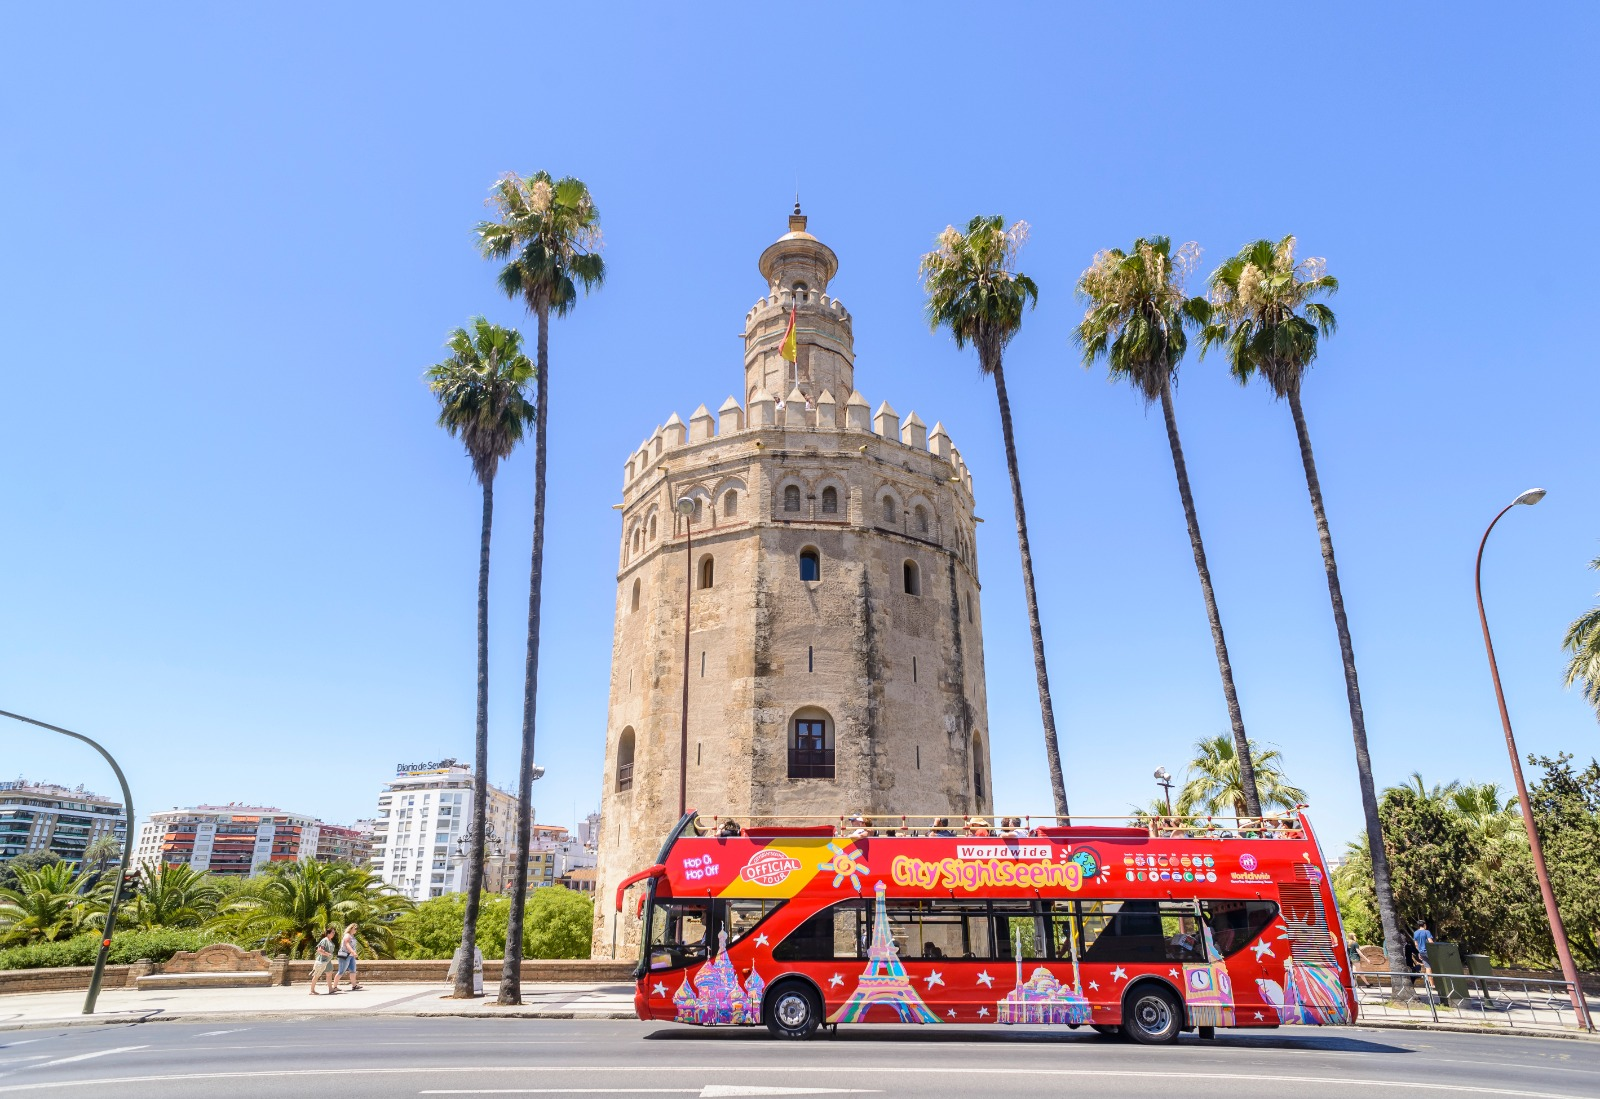 bus city sightseeing torre oro sevilla